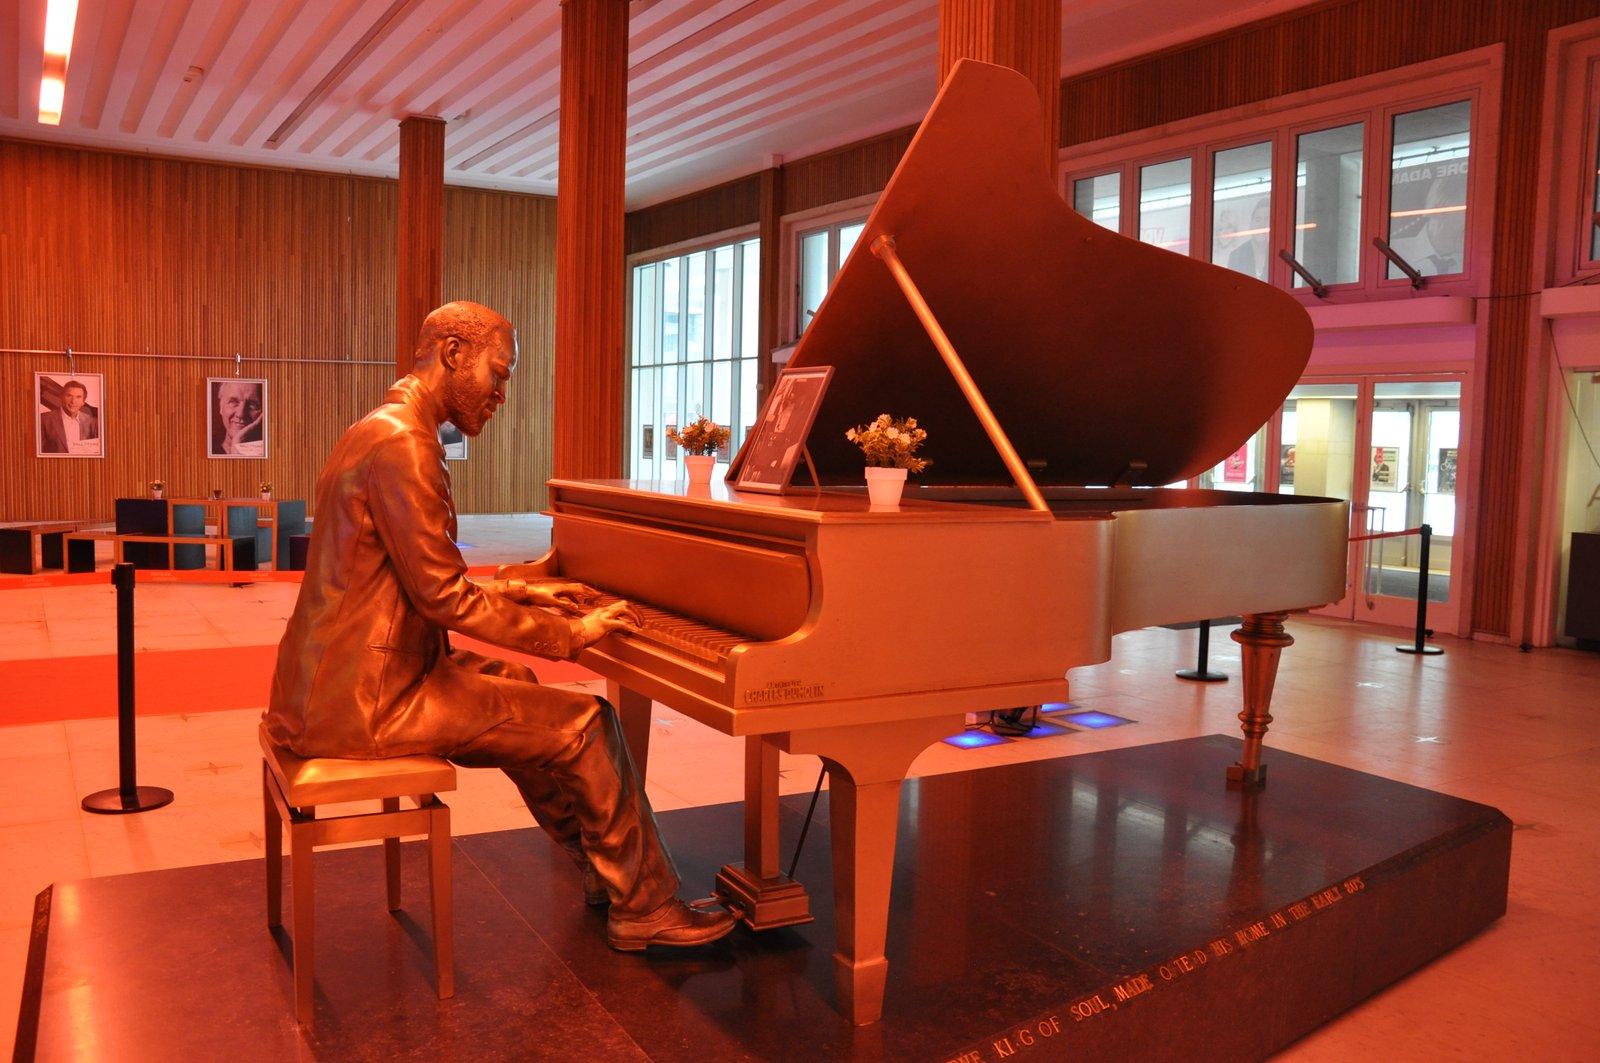 La statue de Marvin Gaye au casino d'Ostende